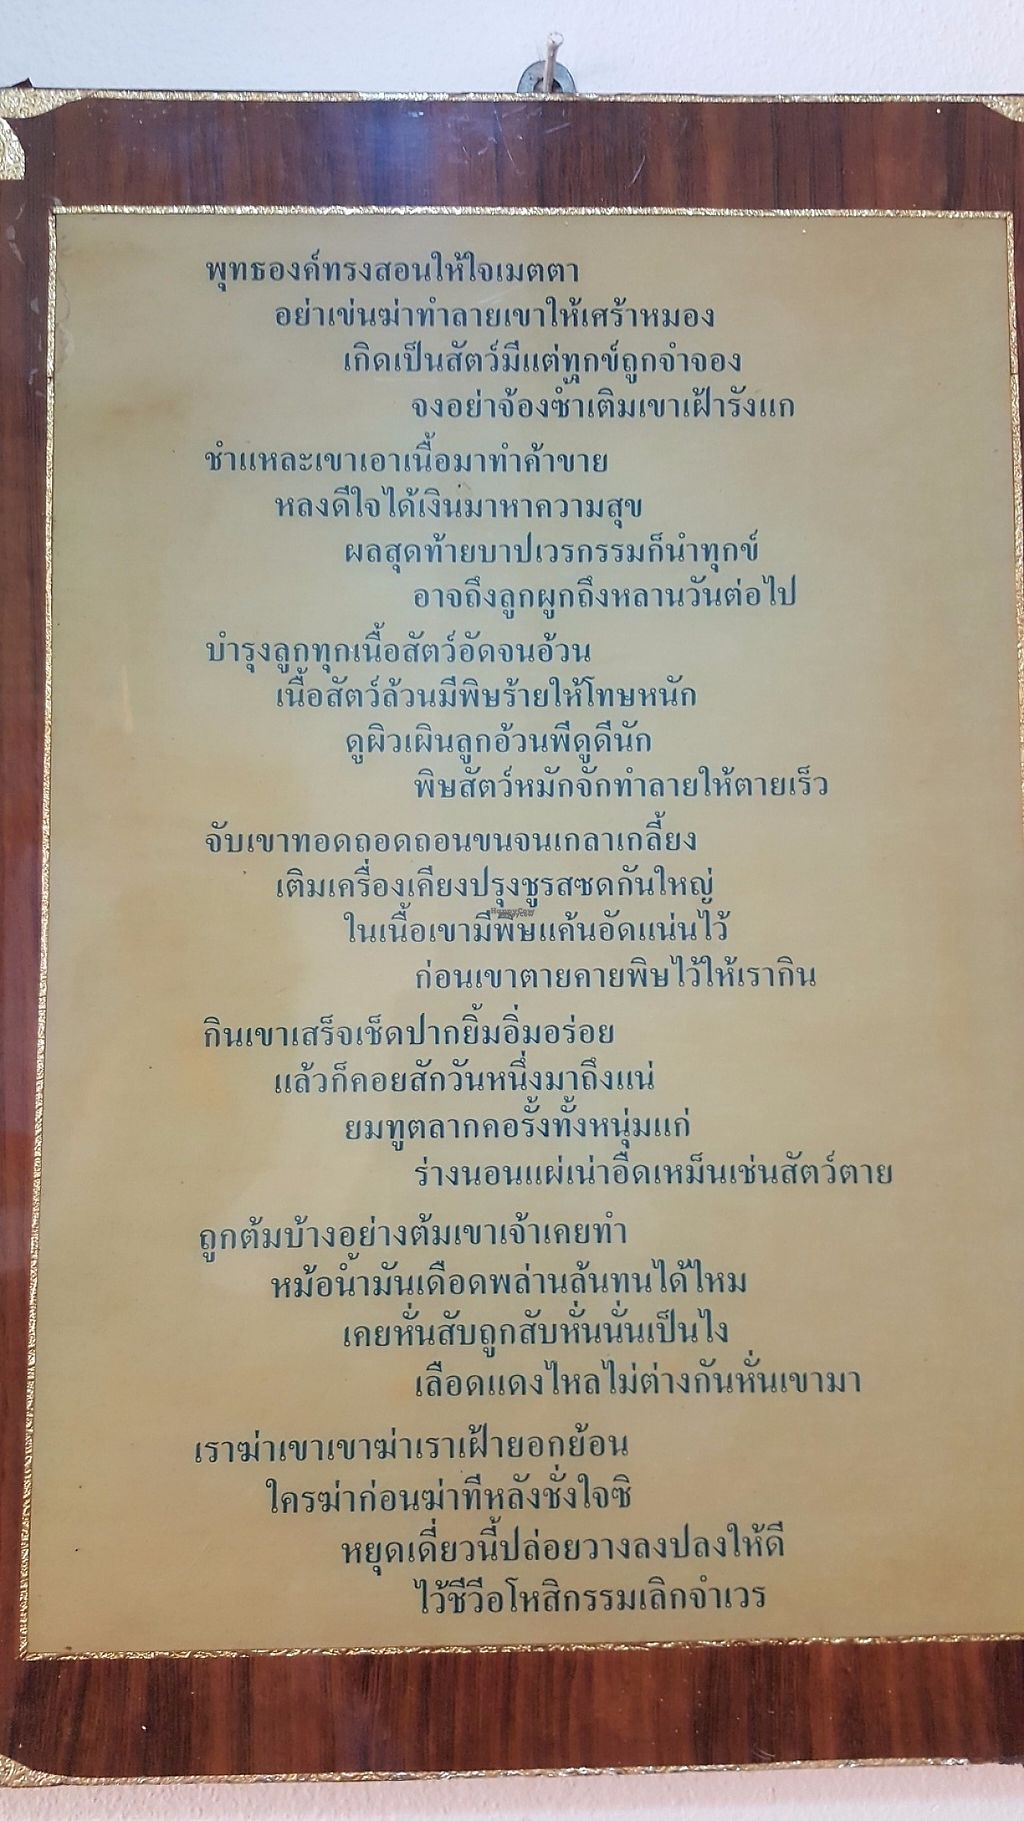 "Photo of Krua Sukkrapap Guan Yin  by <a href=""/members/profile/KimmyLuangsaengtham"">KimmyLuangsaengtham</a> <br/>buddha <br/> January 5, 2017  - <a href='/contact/abuse/image/33587/208262'>Report</a>"